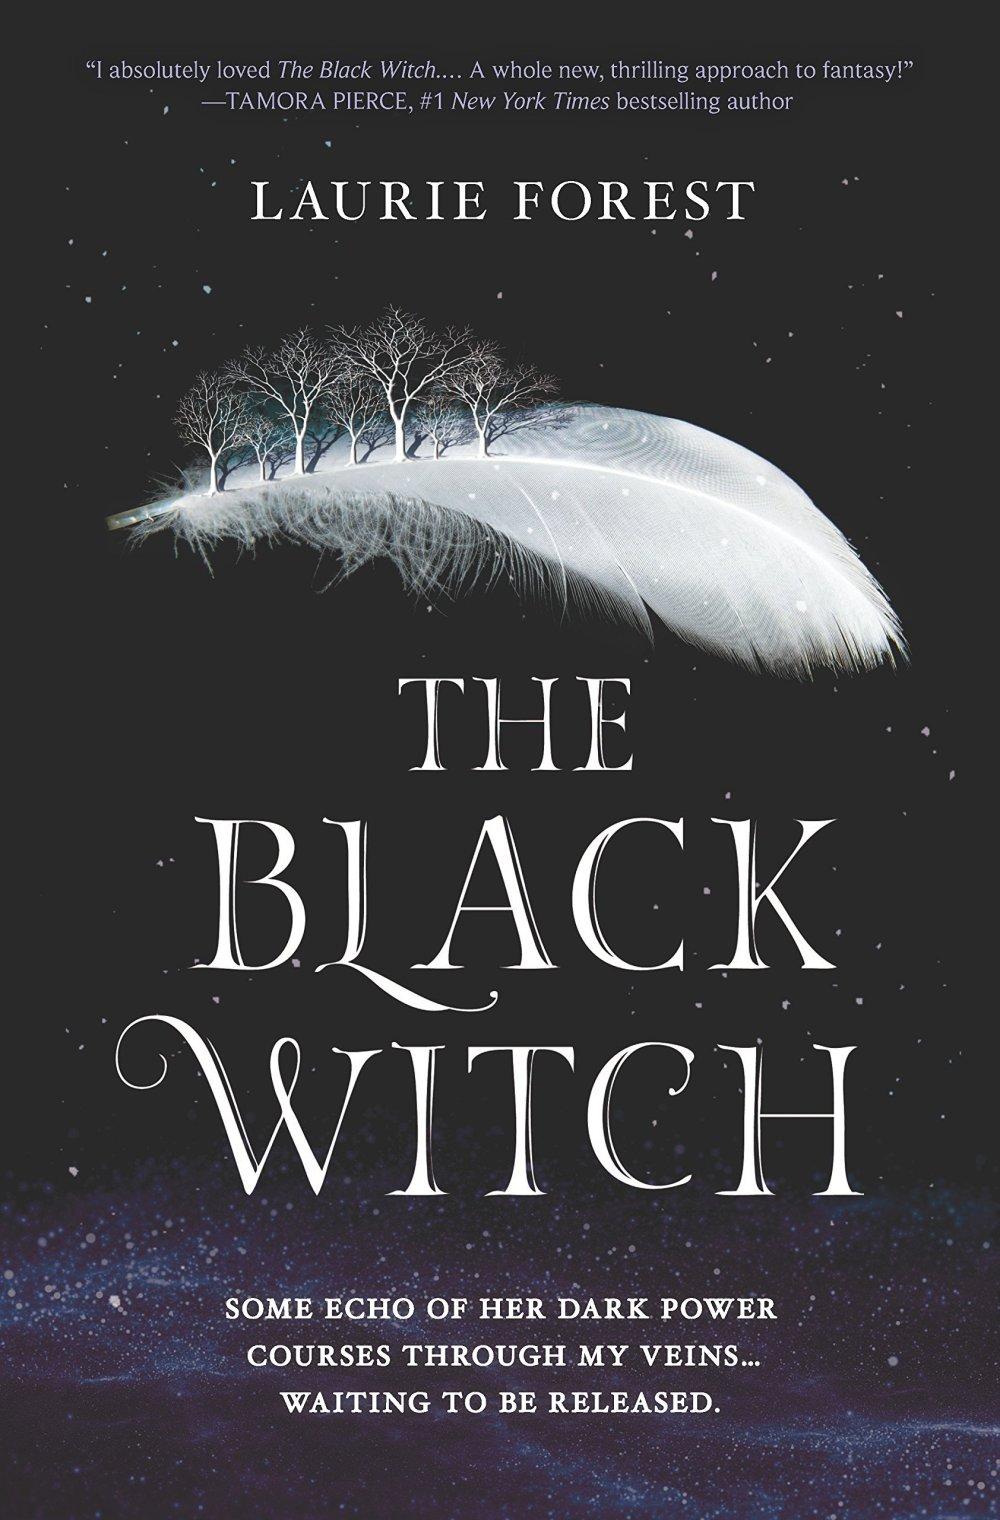 black witch.jpg